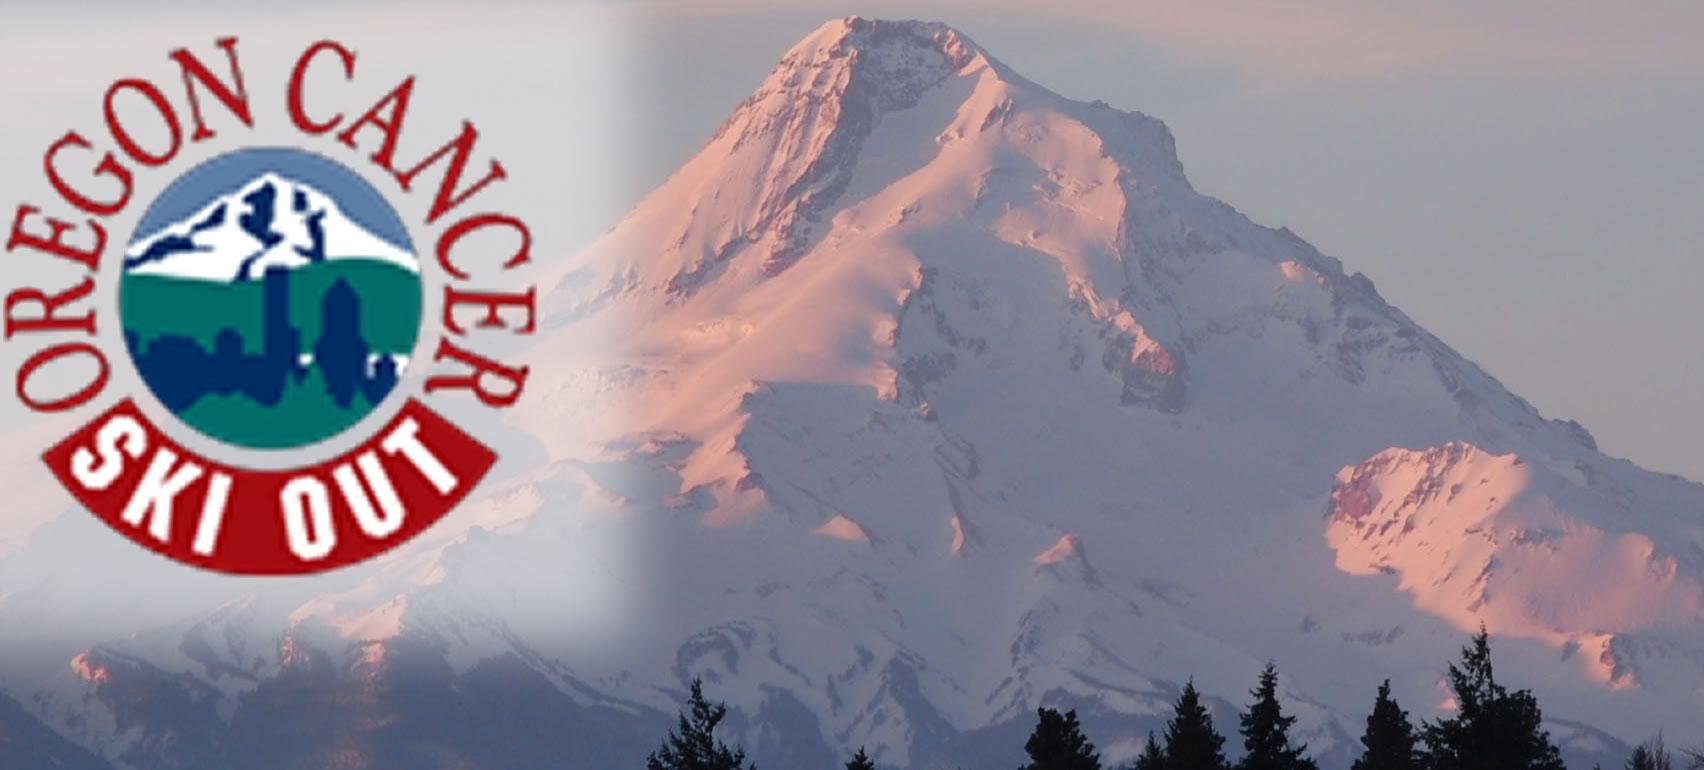 Oregon Skin Care Donations for Ski Cancer